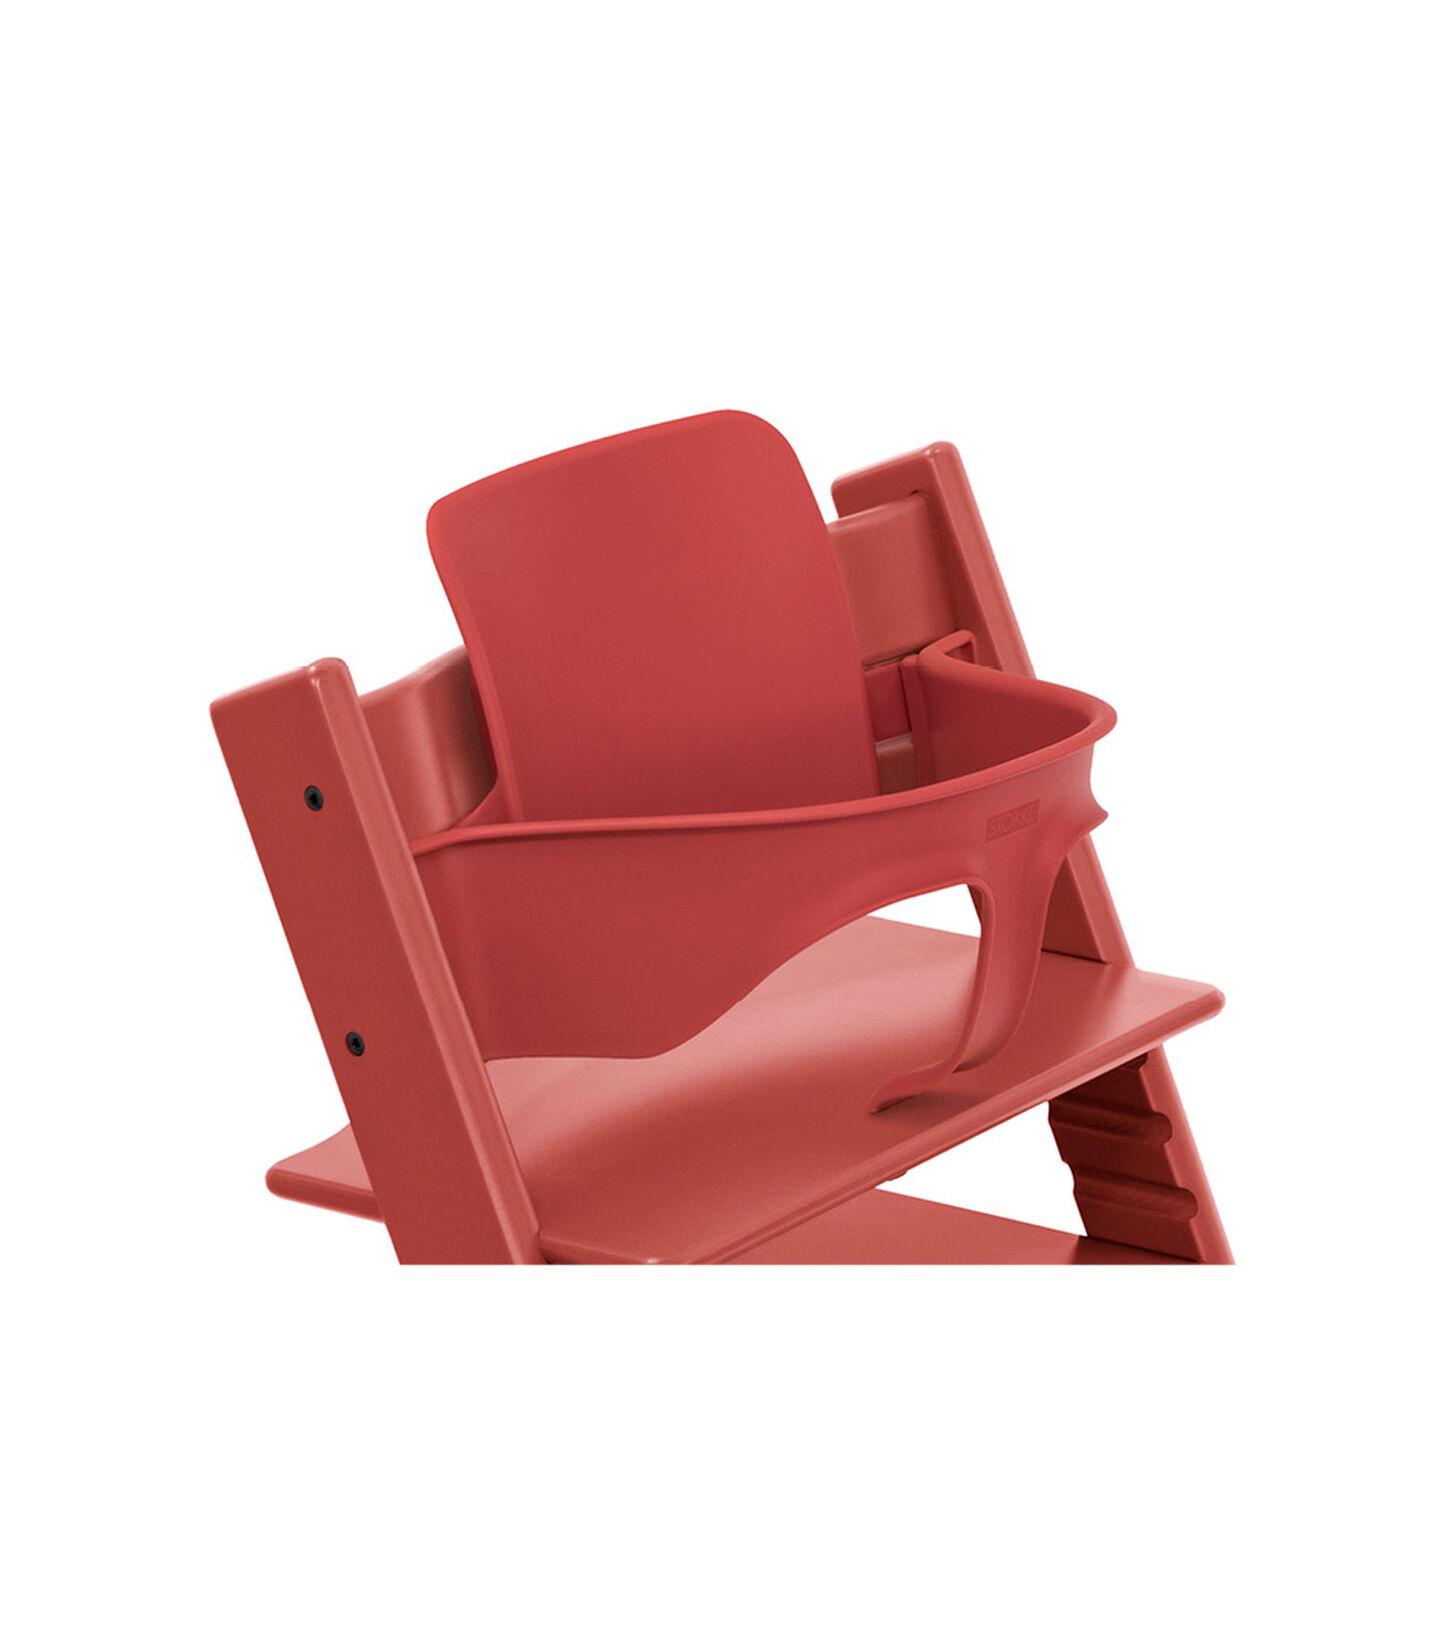 Tripp Trapp® Baby Set Rojo cálido, Rojo cálido, mainview view 1